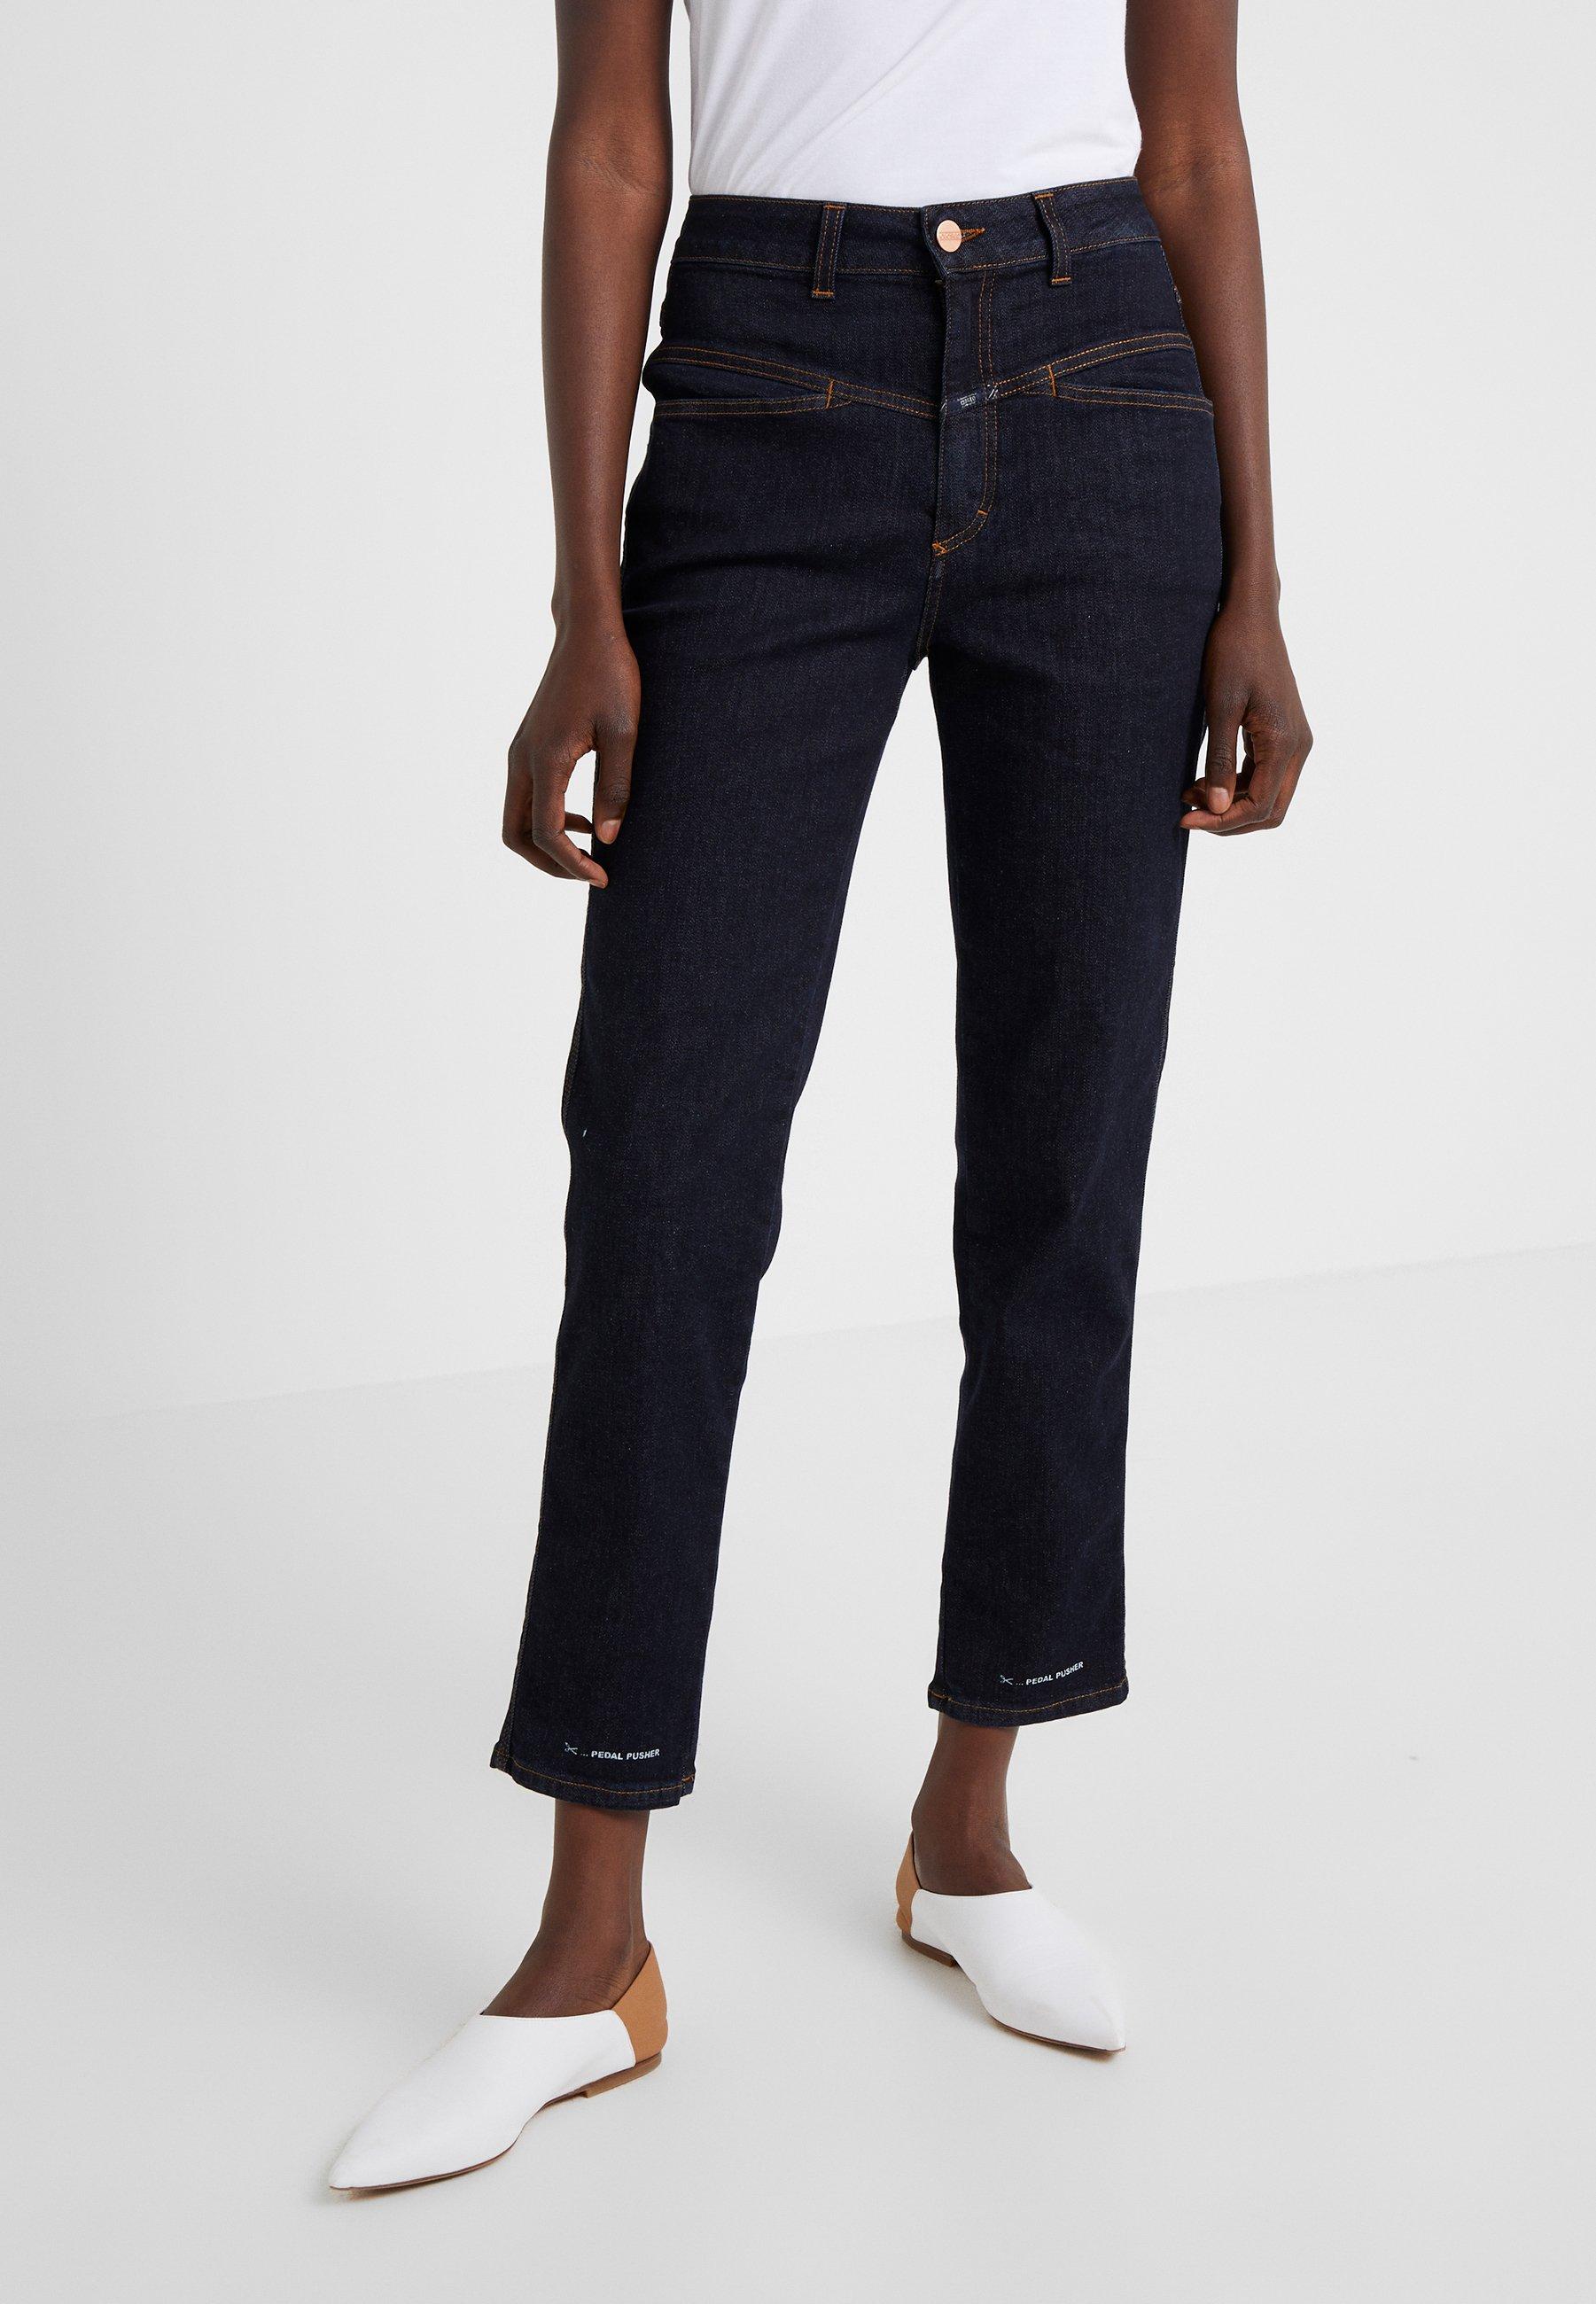 CLOSED PEDAL PUSHER - Jeans straight leg - dark blue